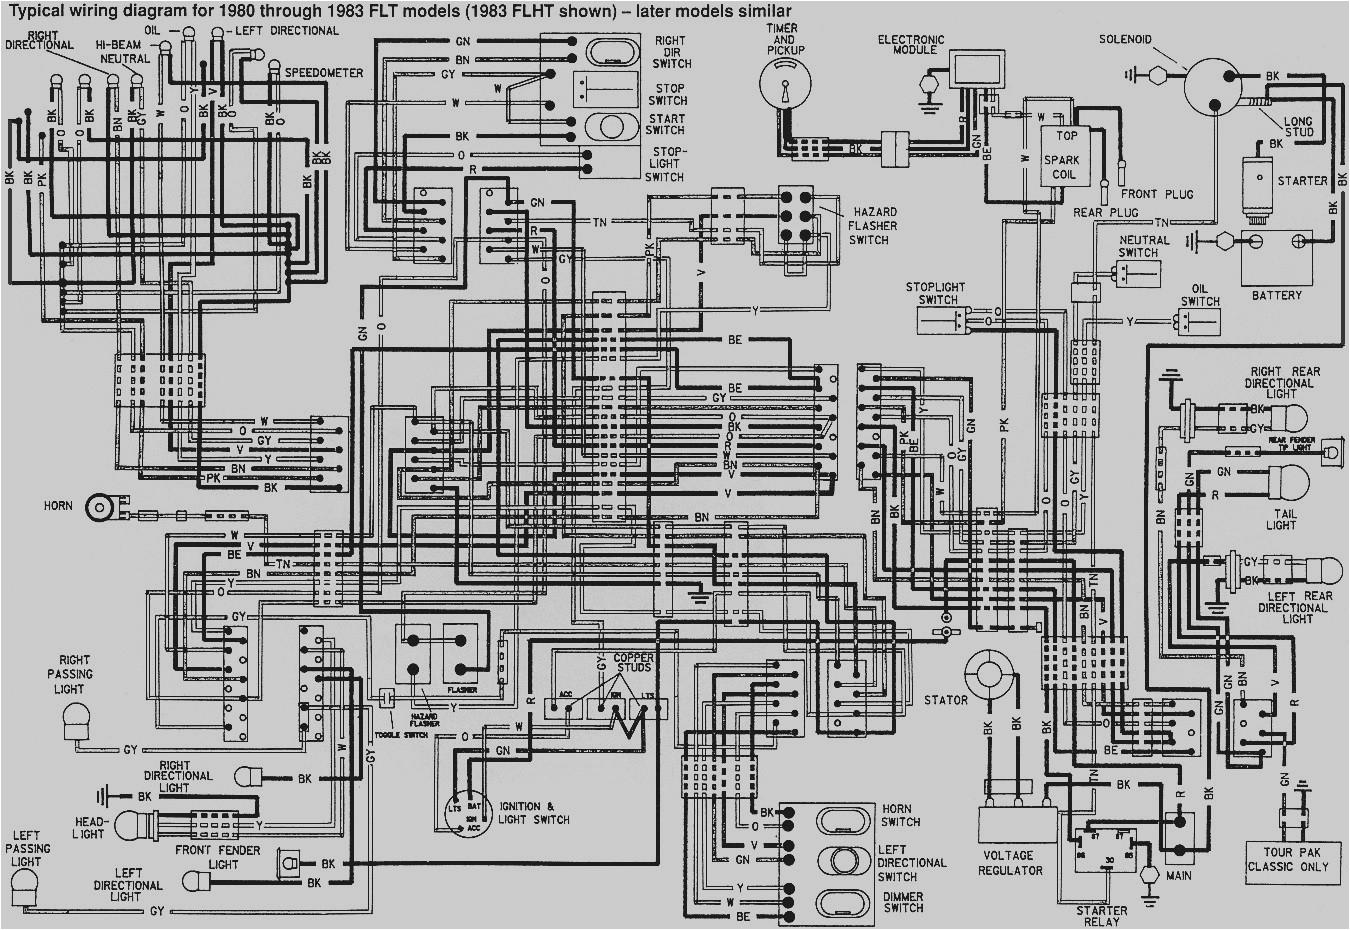 harley davidson 2008 flhx wiring diagram wiring diagram inside 2011 harley davidson radio wiring diagram harley davidson radio wiring diagram